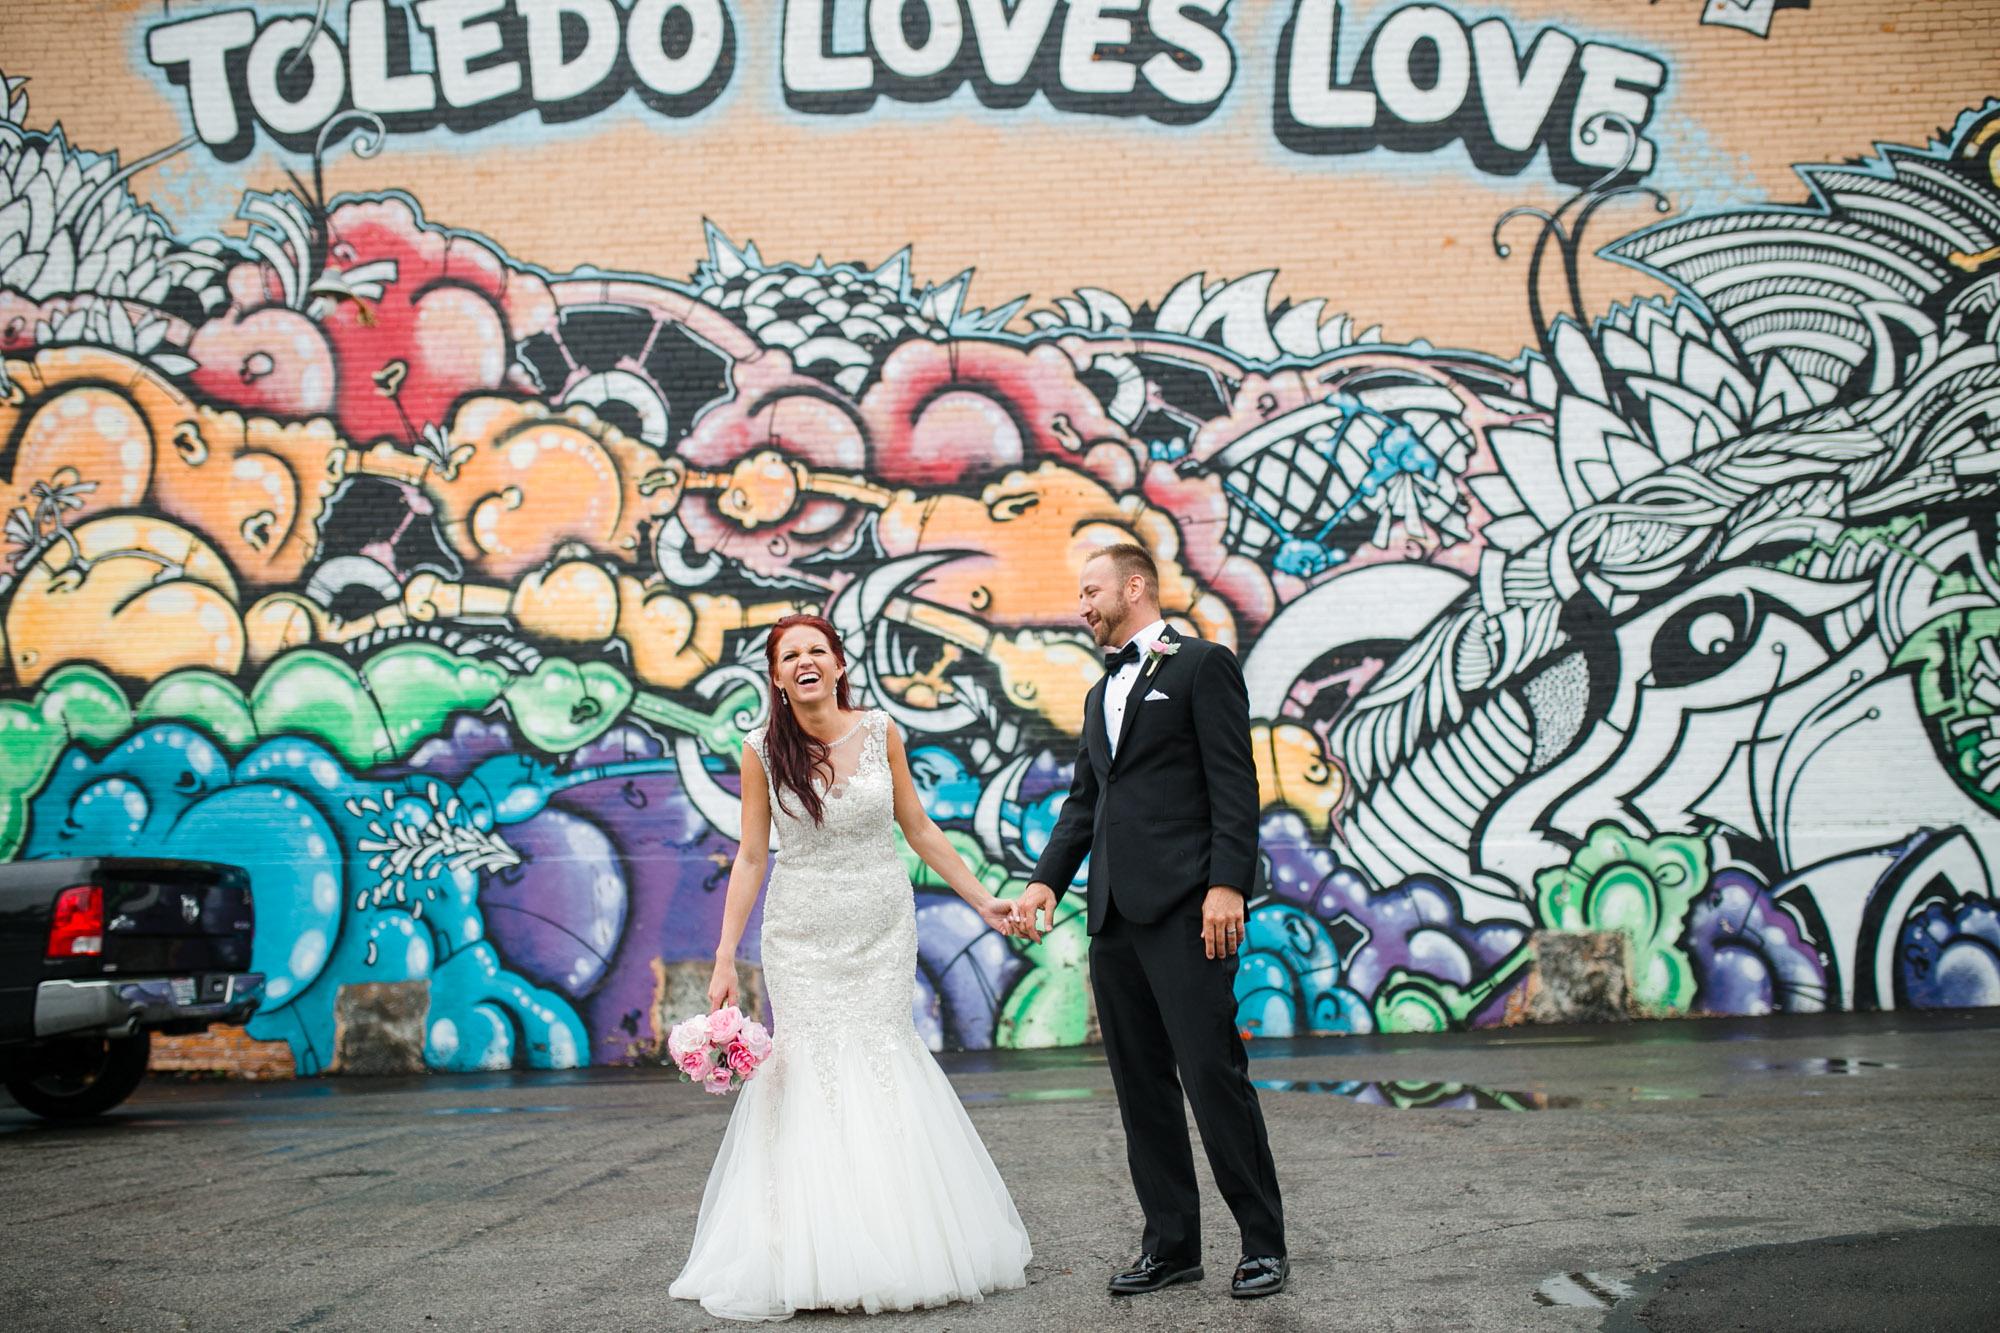 hensville-wedding-downtown-toledo-ohio (67 of 103).jpg